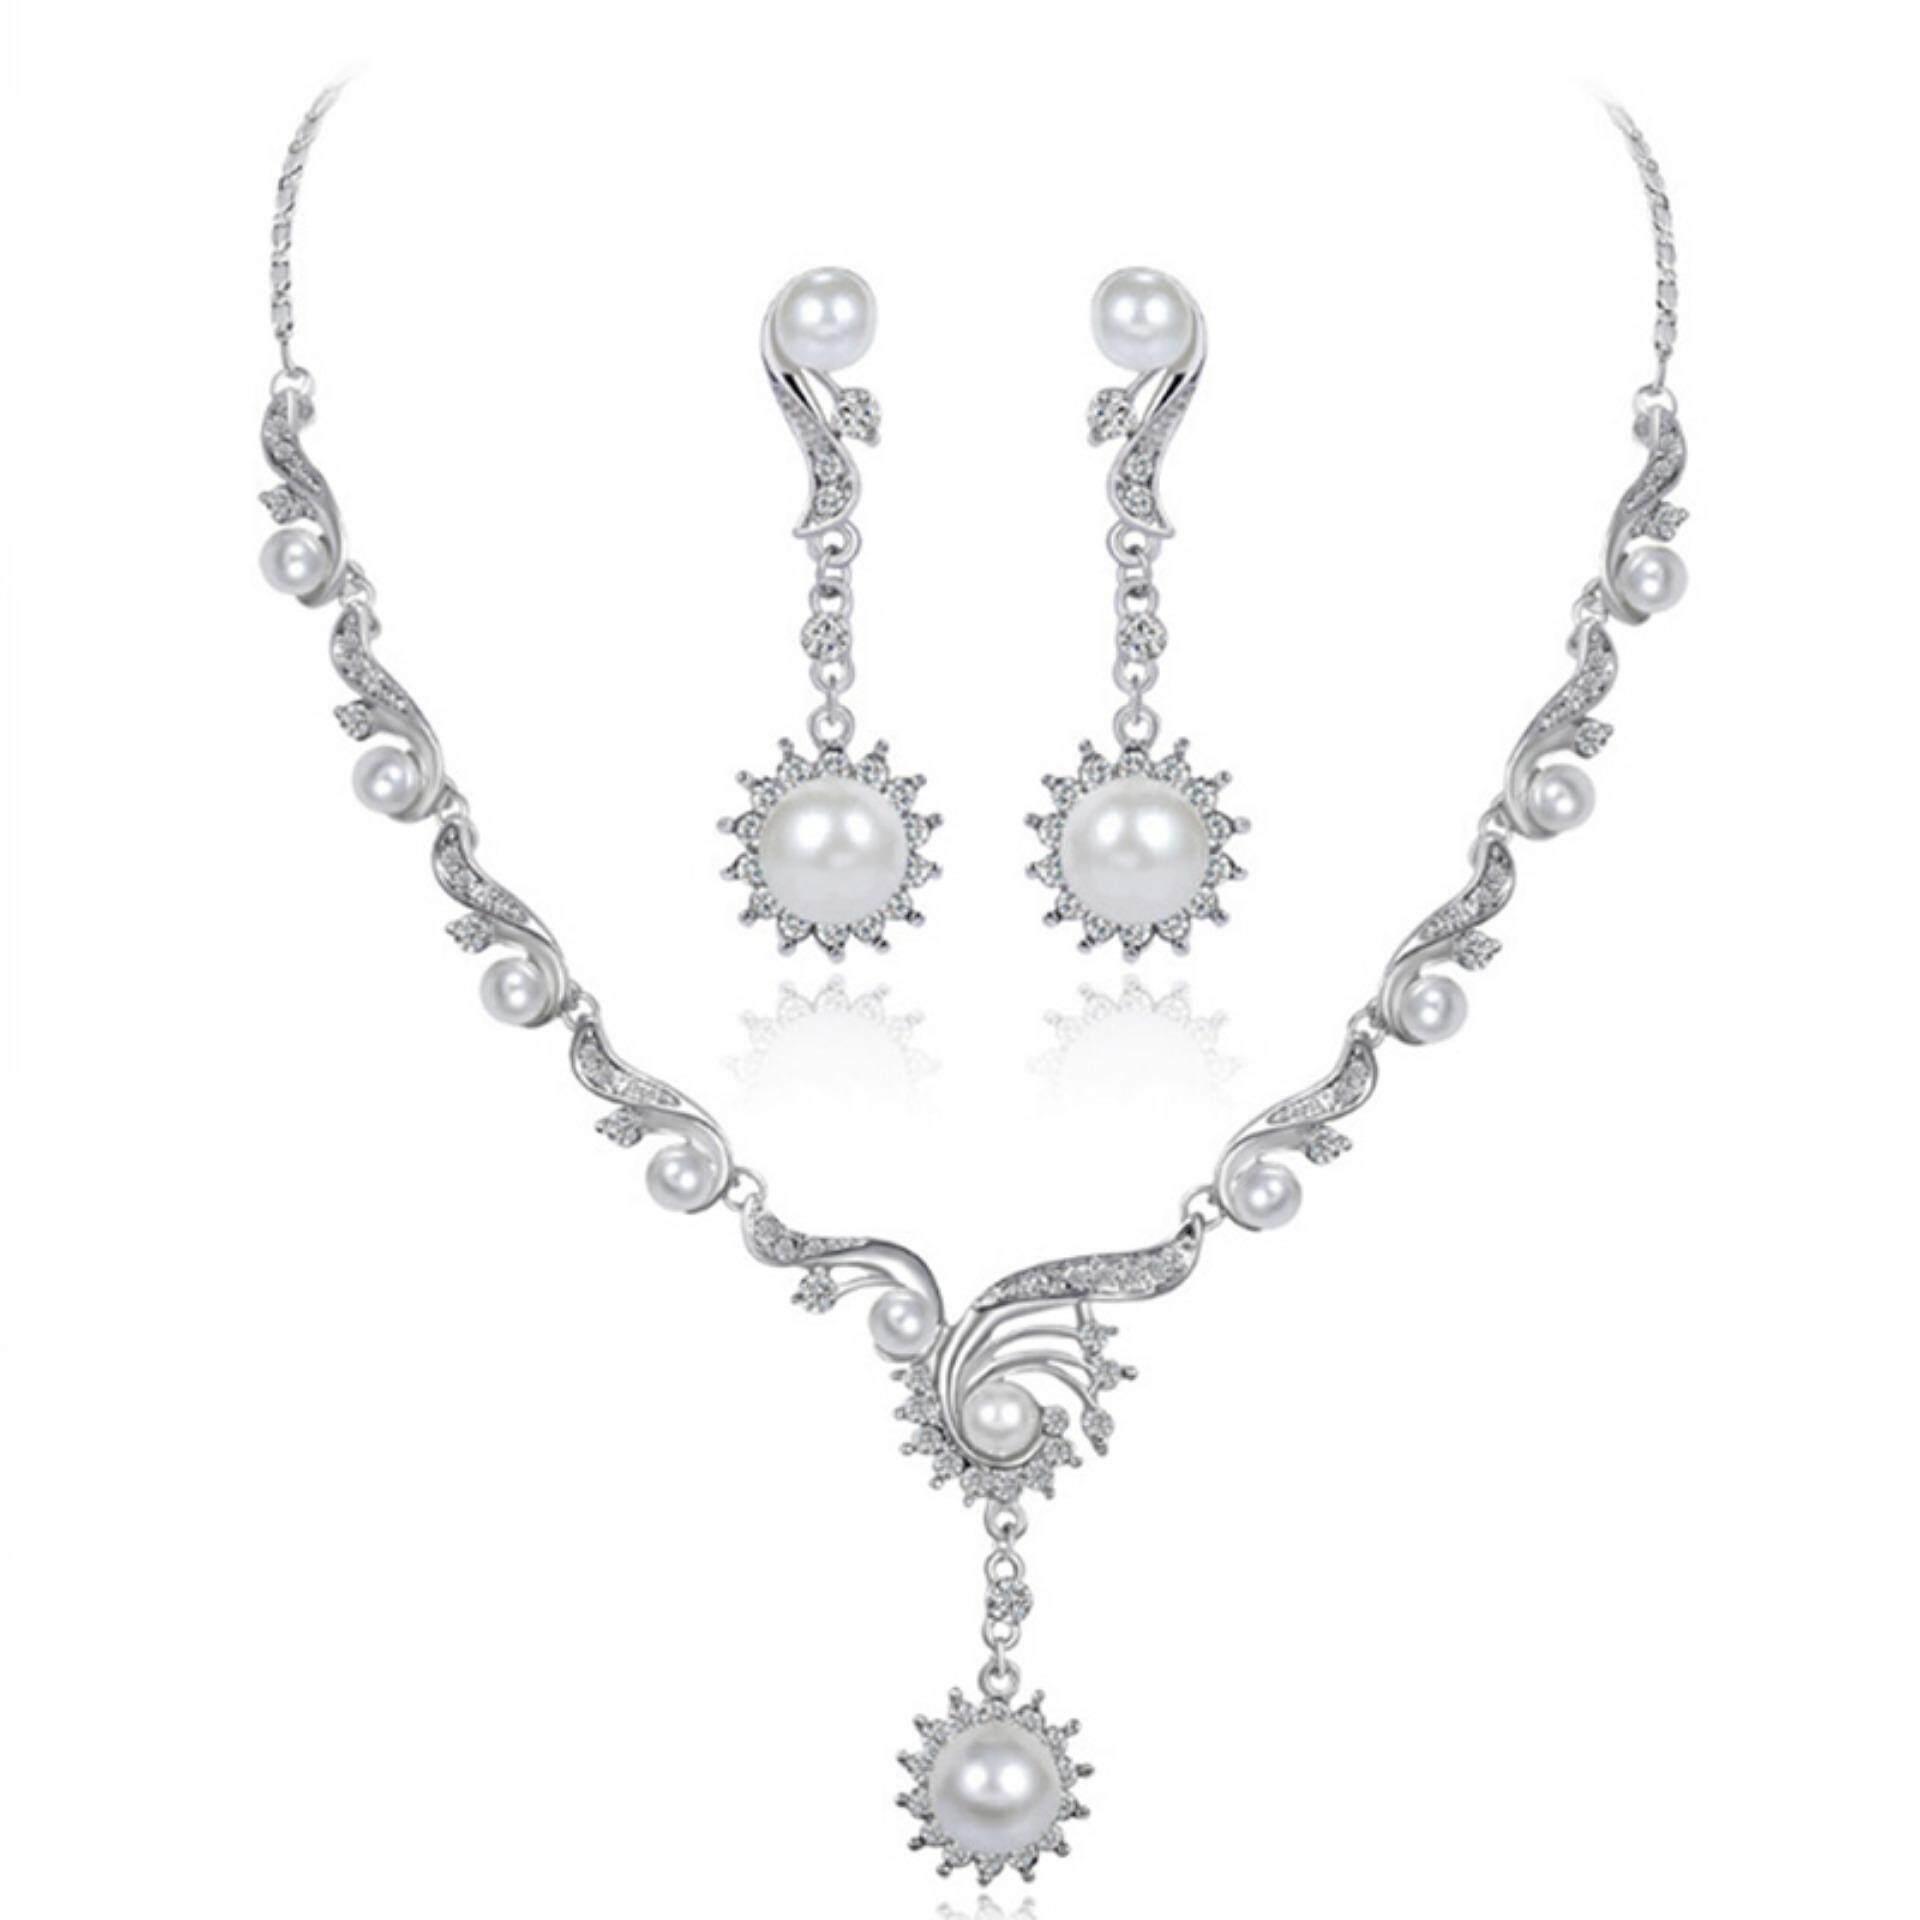 Pengantin Pernikahan Mutiara Imitasi Kalung Berlian Imitasi Anting-Anting Set Perhiasan Aksesoris Putih